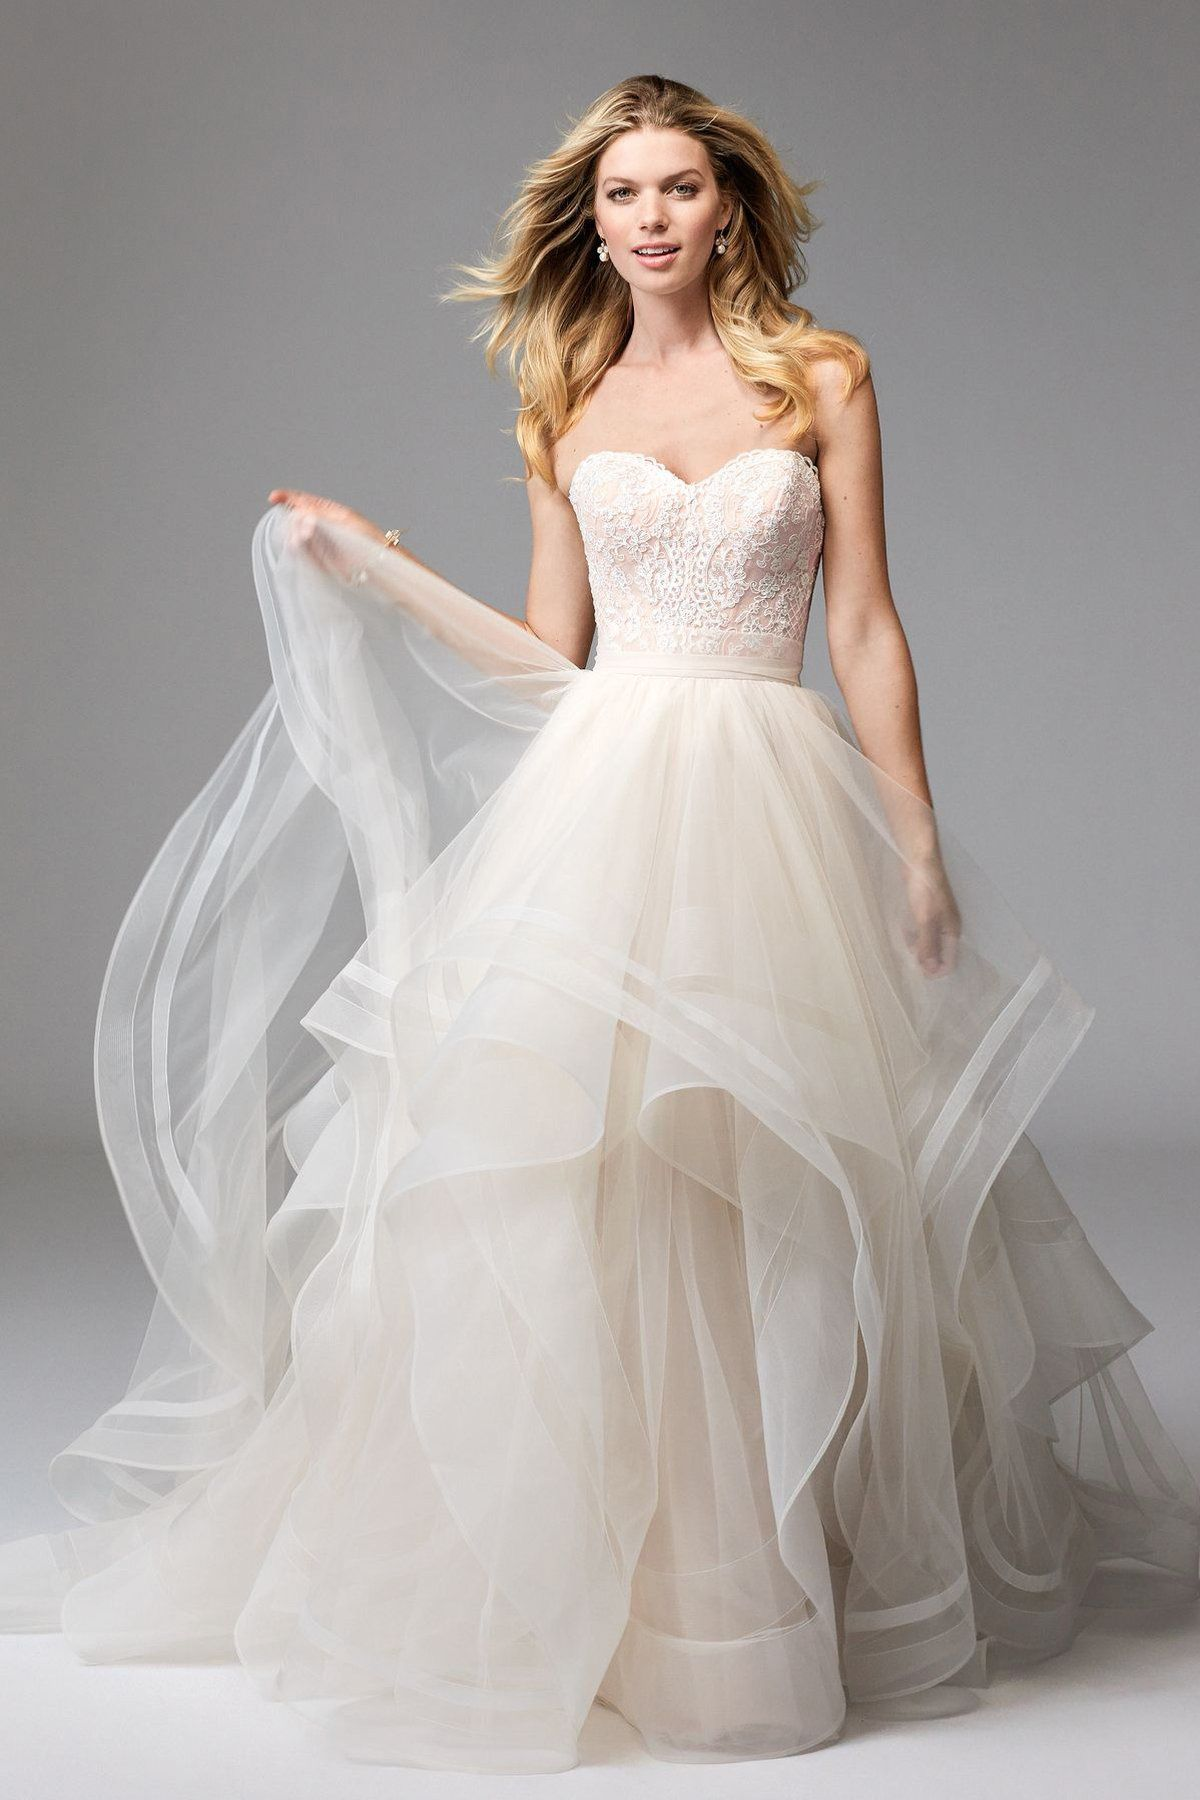 Styles of wedding dresses  Effie Skirt  Wedding  Pinterest  Wedding dress Wedding and Weddings